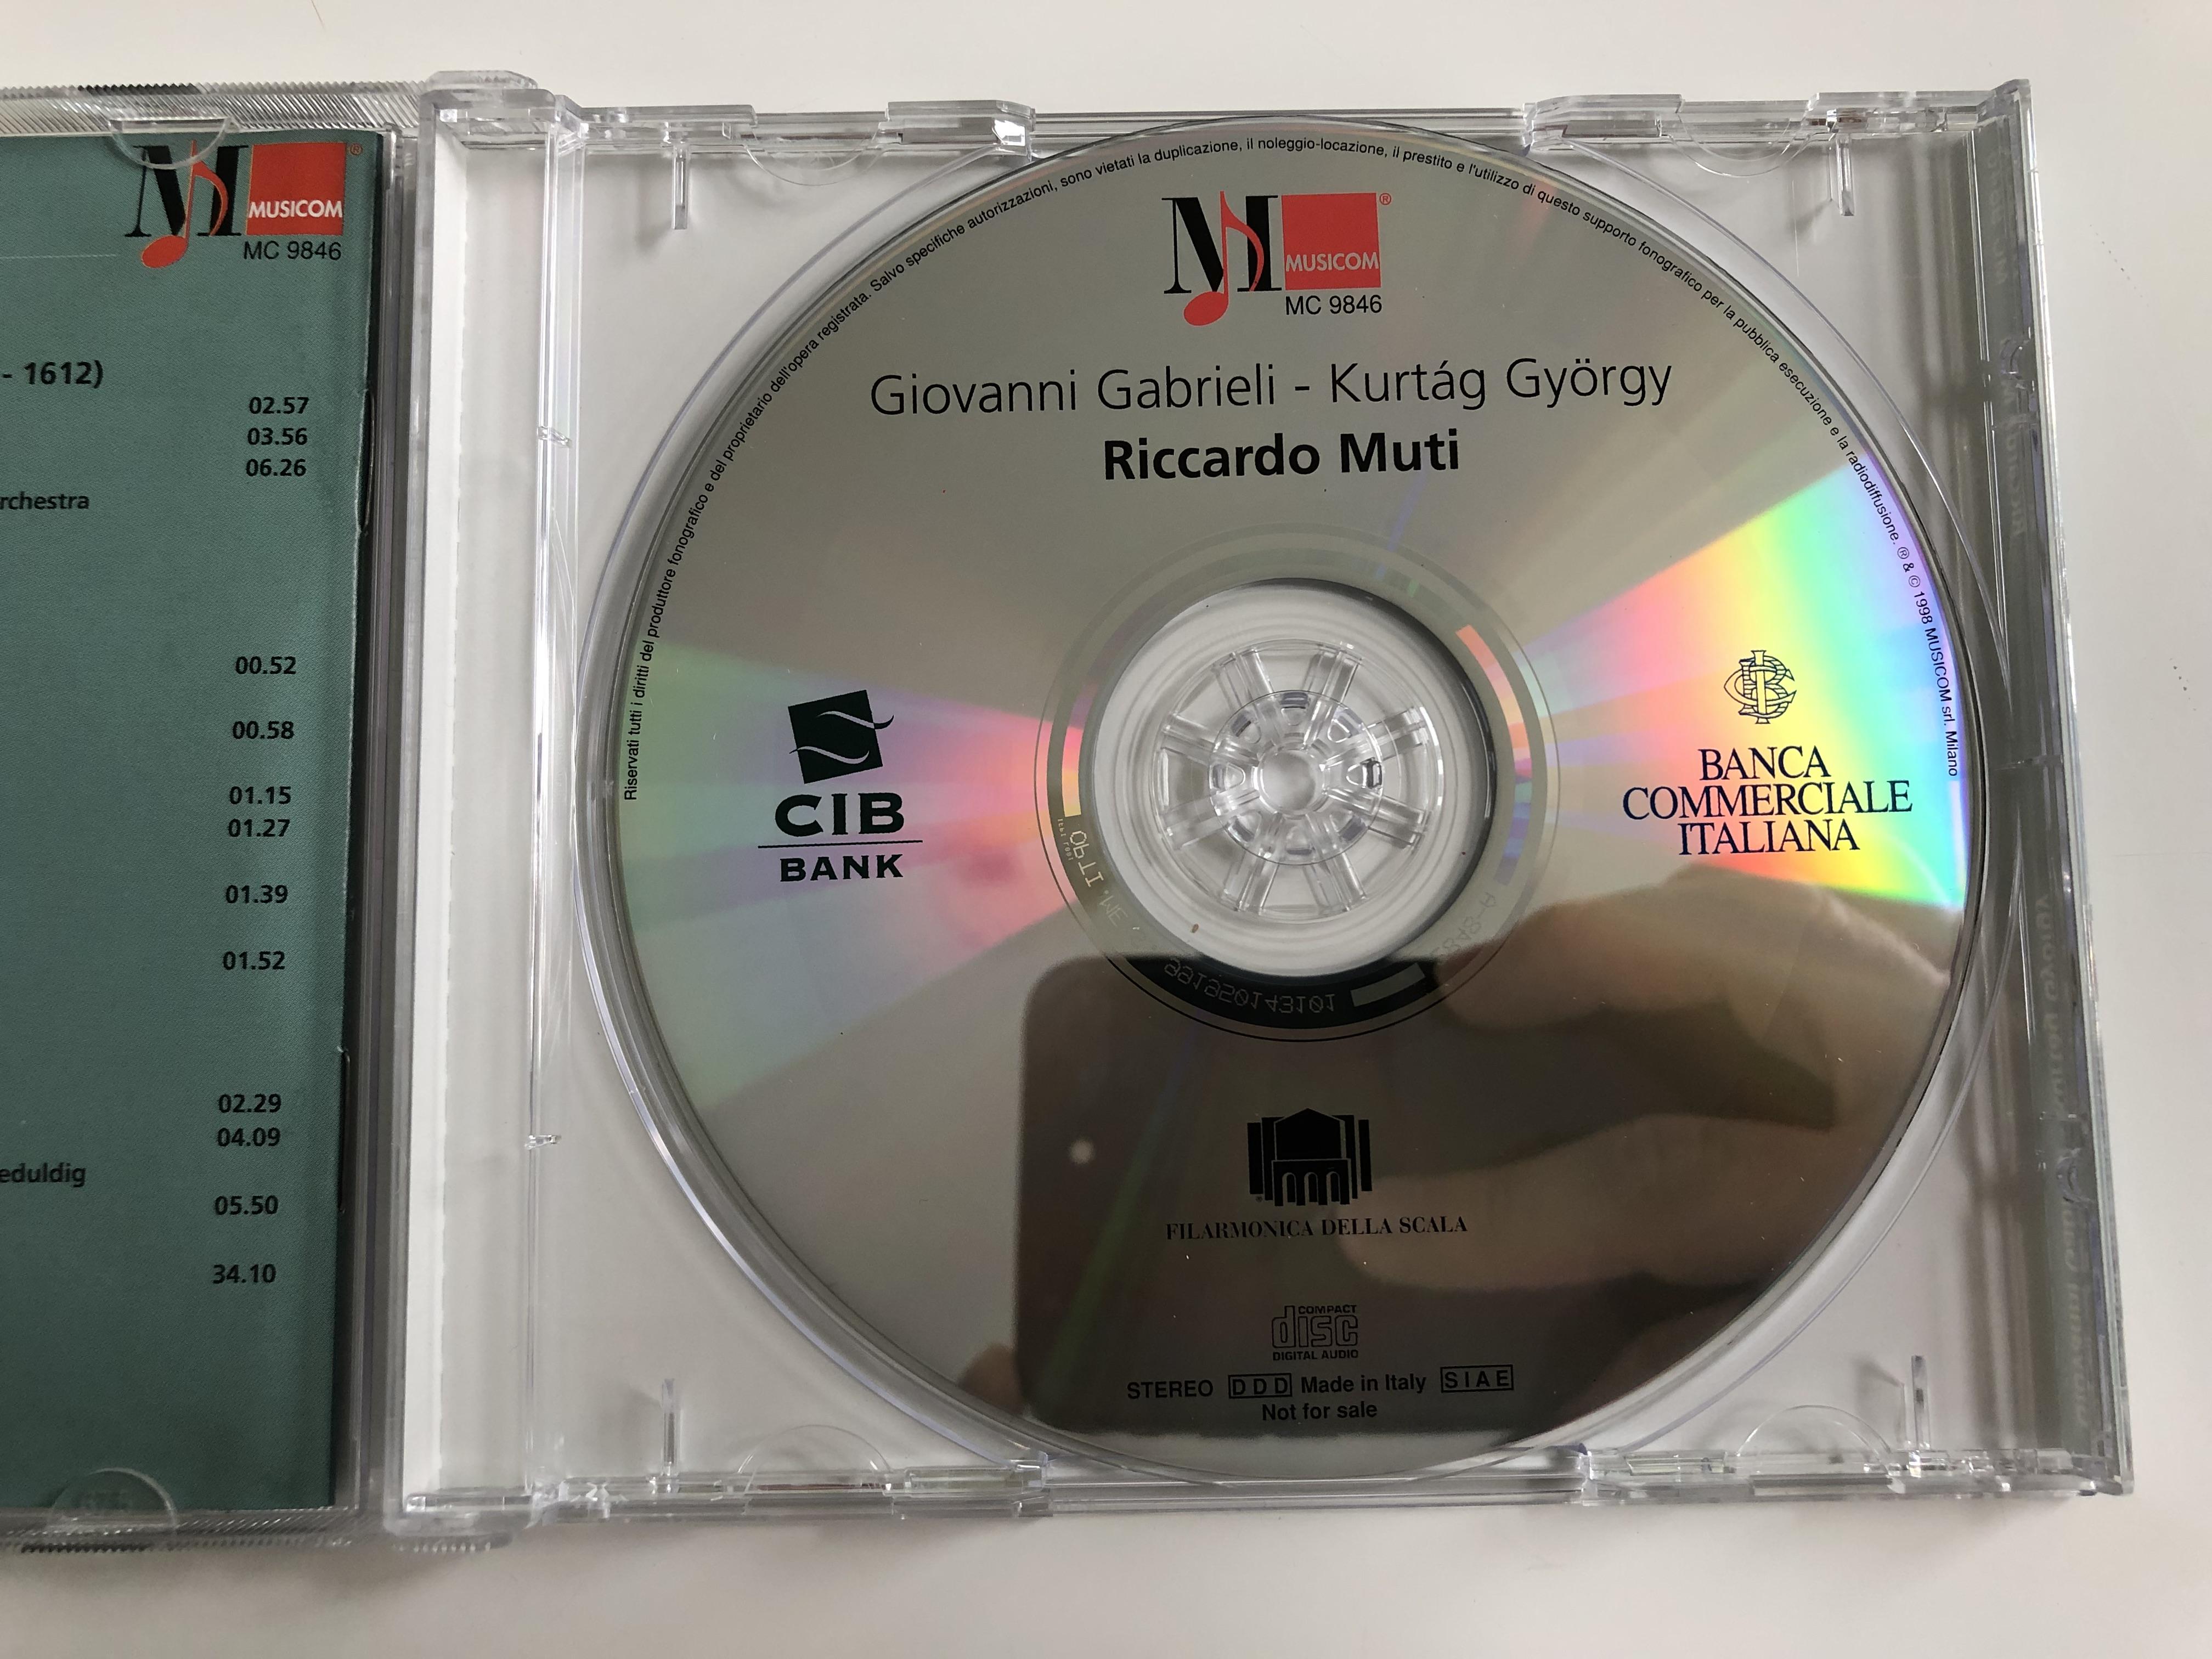 milano-musica-festival-gy-rgy-kurt-g-giovanni-gabrieli-kurt-g-gy-rgy-riccardo-muti-filarmonica-della-scala-musicom-audio-cd-1998-stereo-mc-9846-12-.jpg